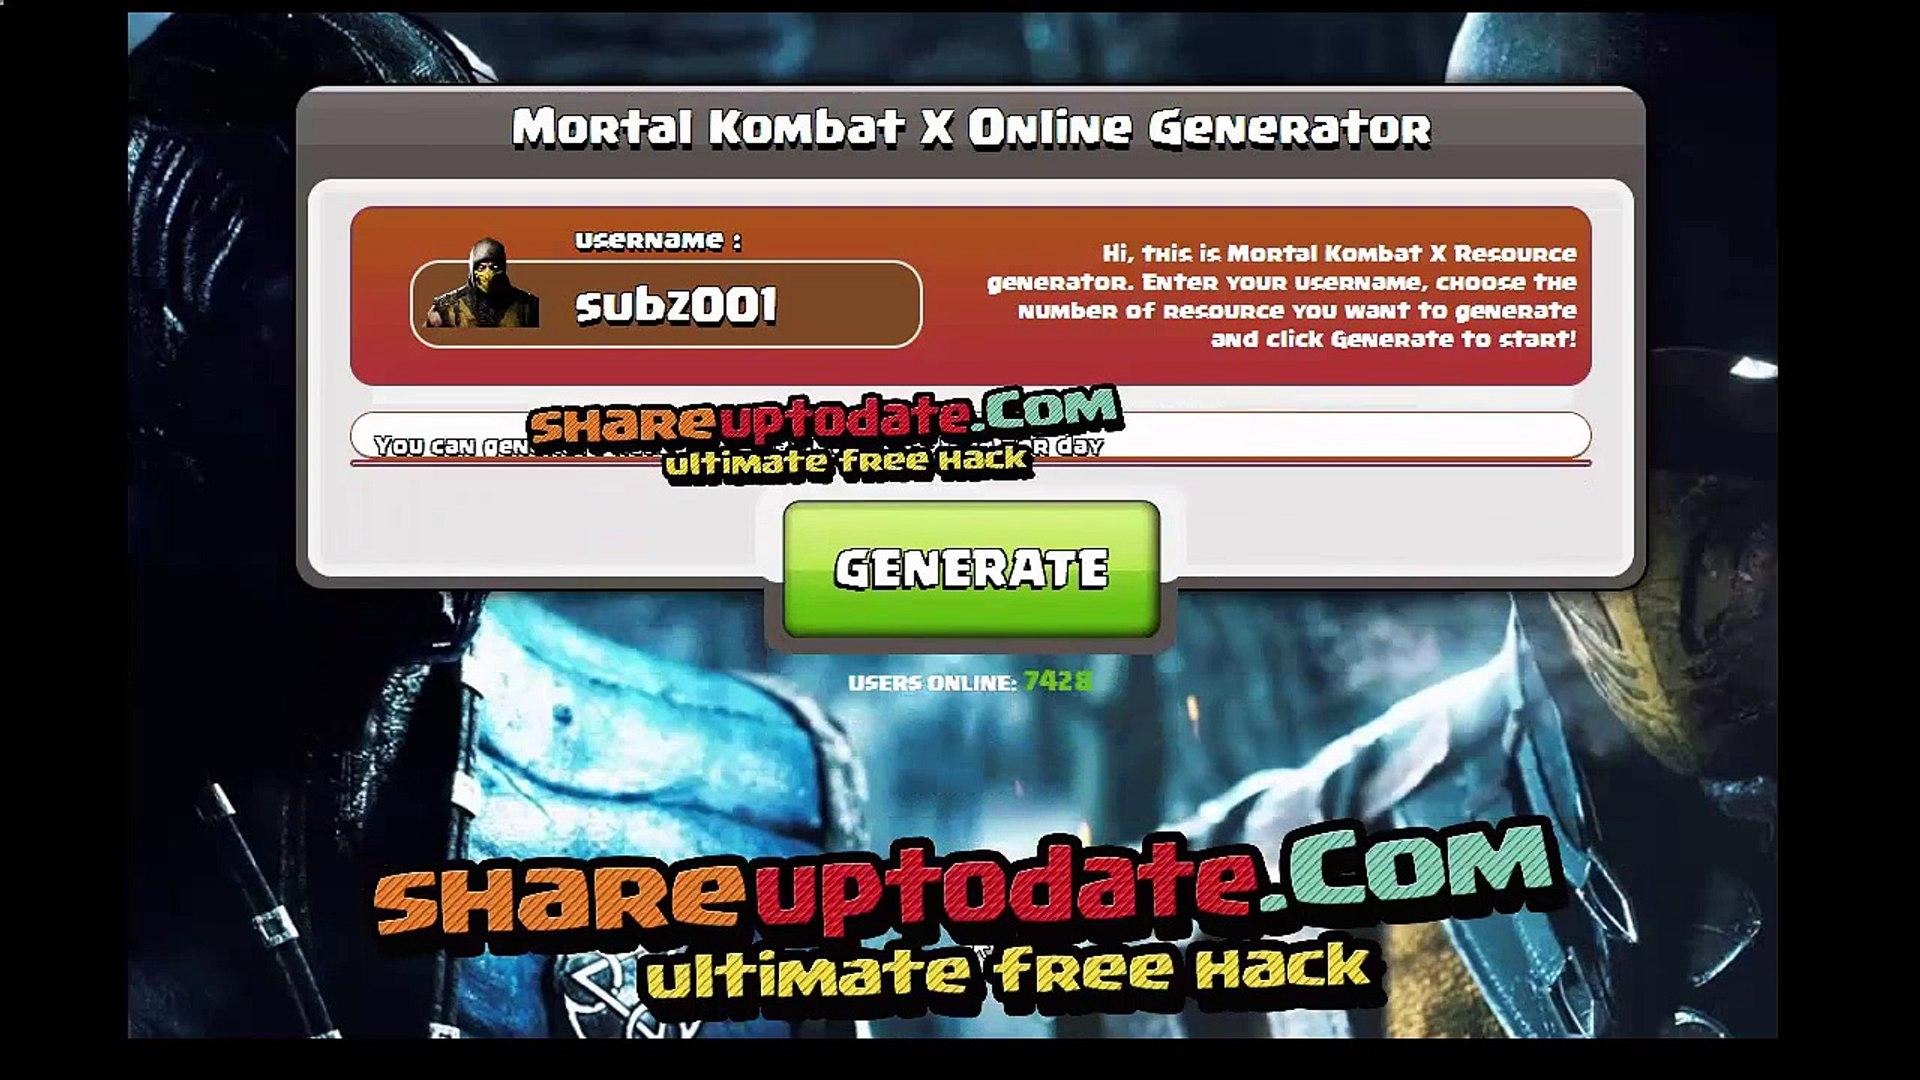 How to get LEGIT free souls, Mortal Kombat X cheat, No Hack tool, Unlimited  souls koins!